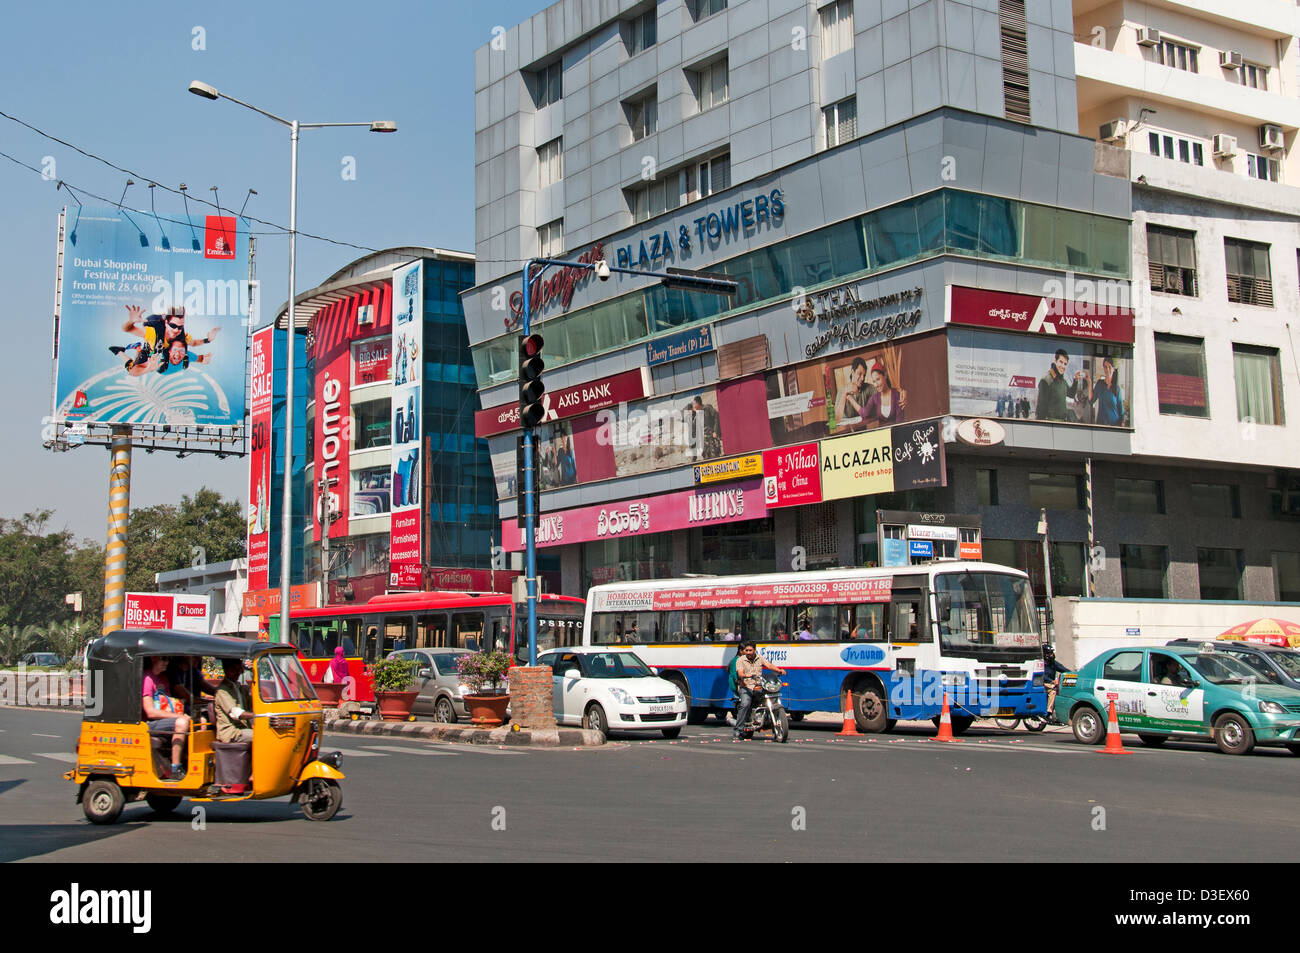 Plaza Towers Modern City Center Hyderabad India Andhra Pradesh - Stock Image